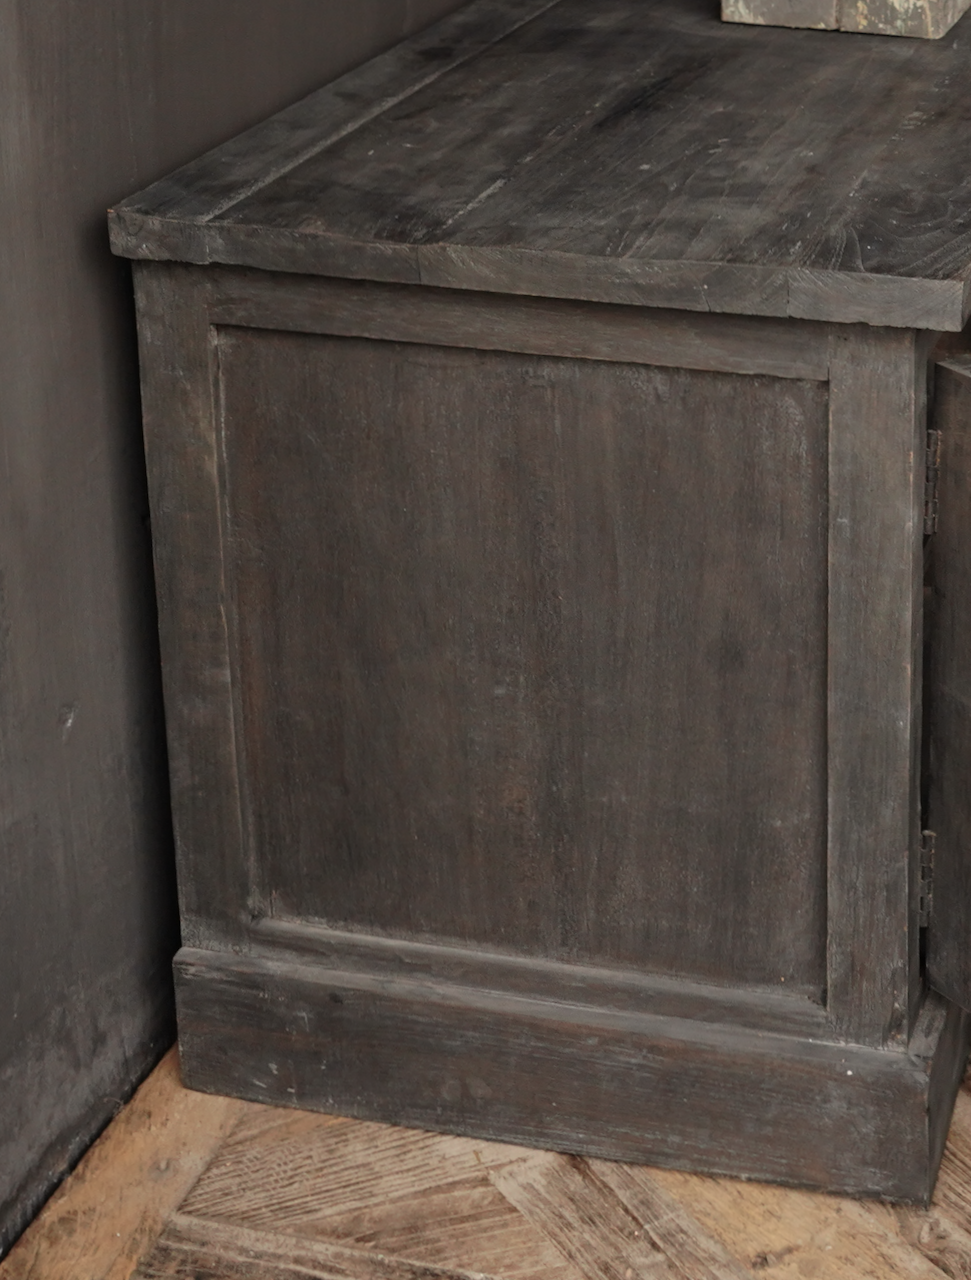 Stoer Tv Furniture / sideboard made of old wood-4